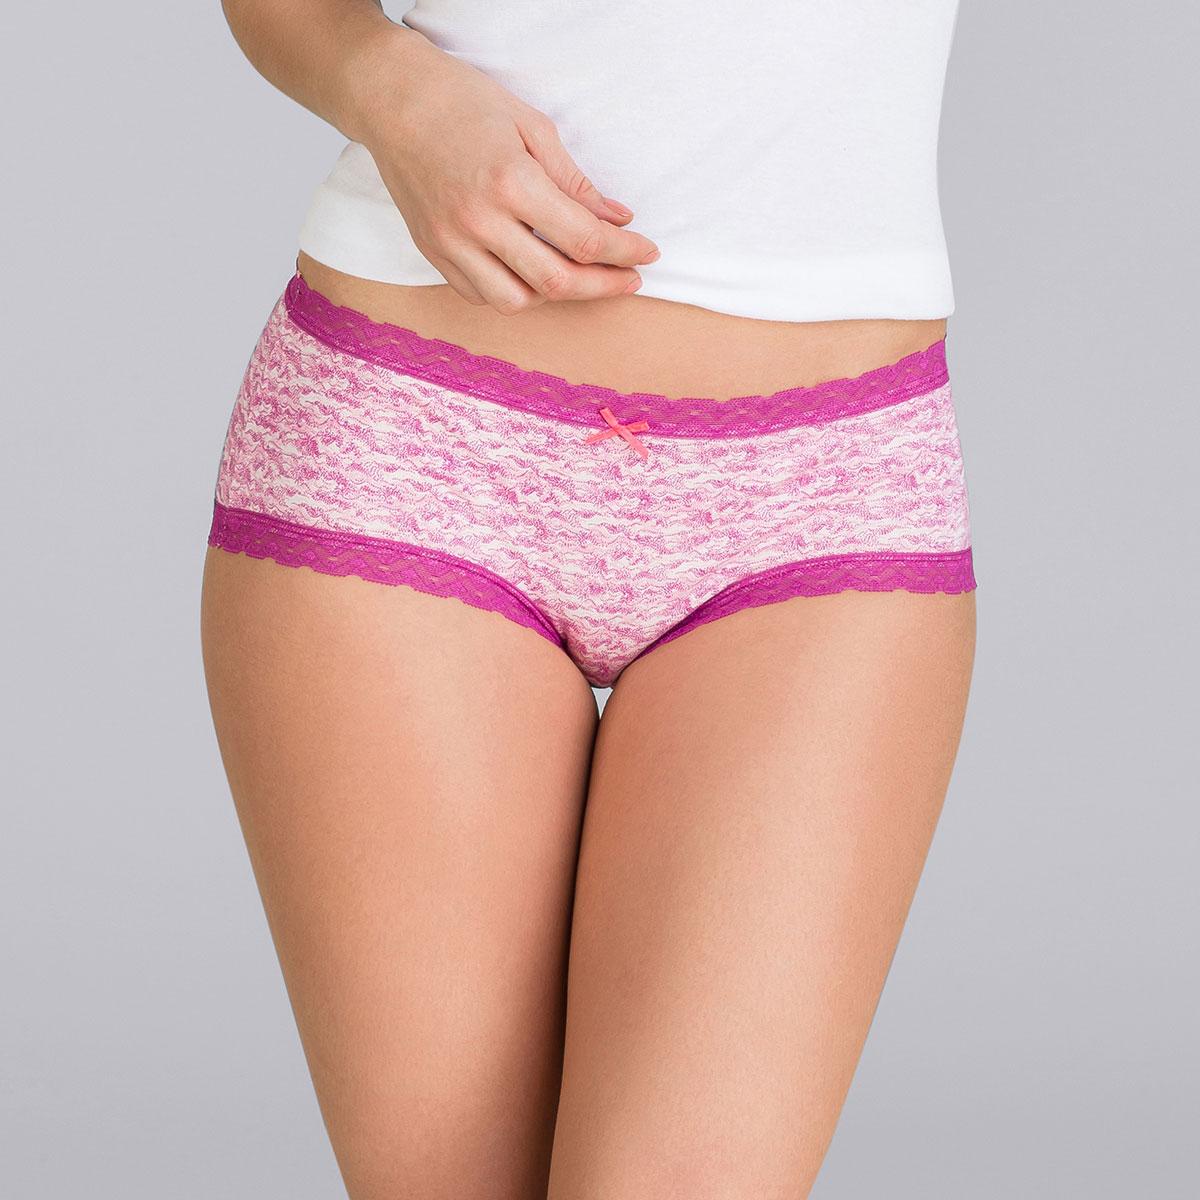 2 Pack purple mix shorts - Basic Cotton Fancy-PLAYTEX